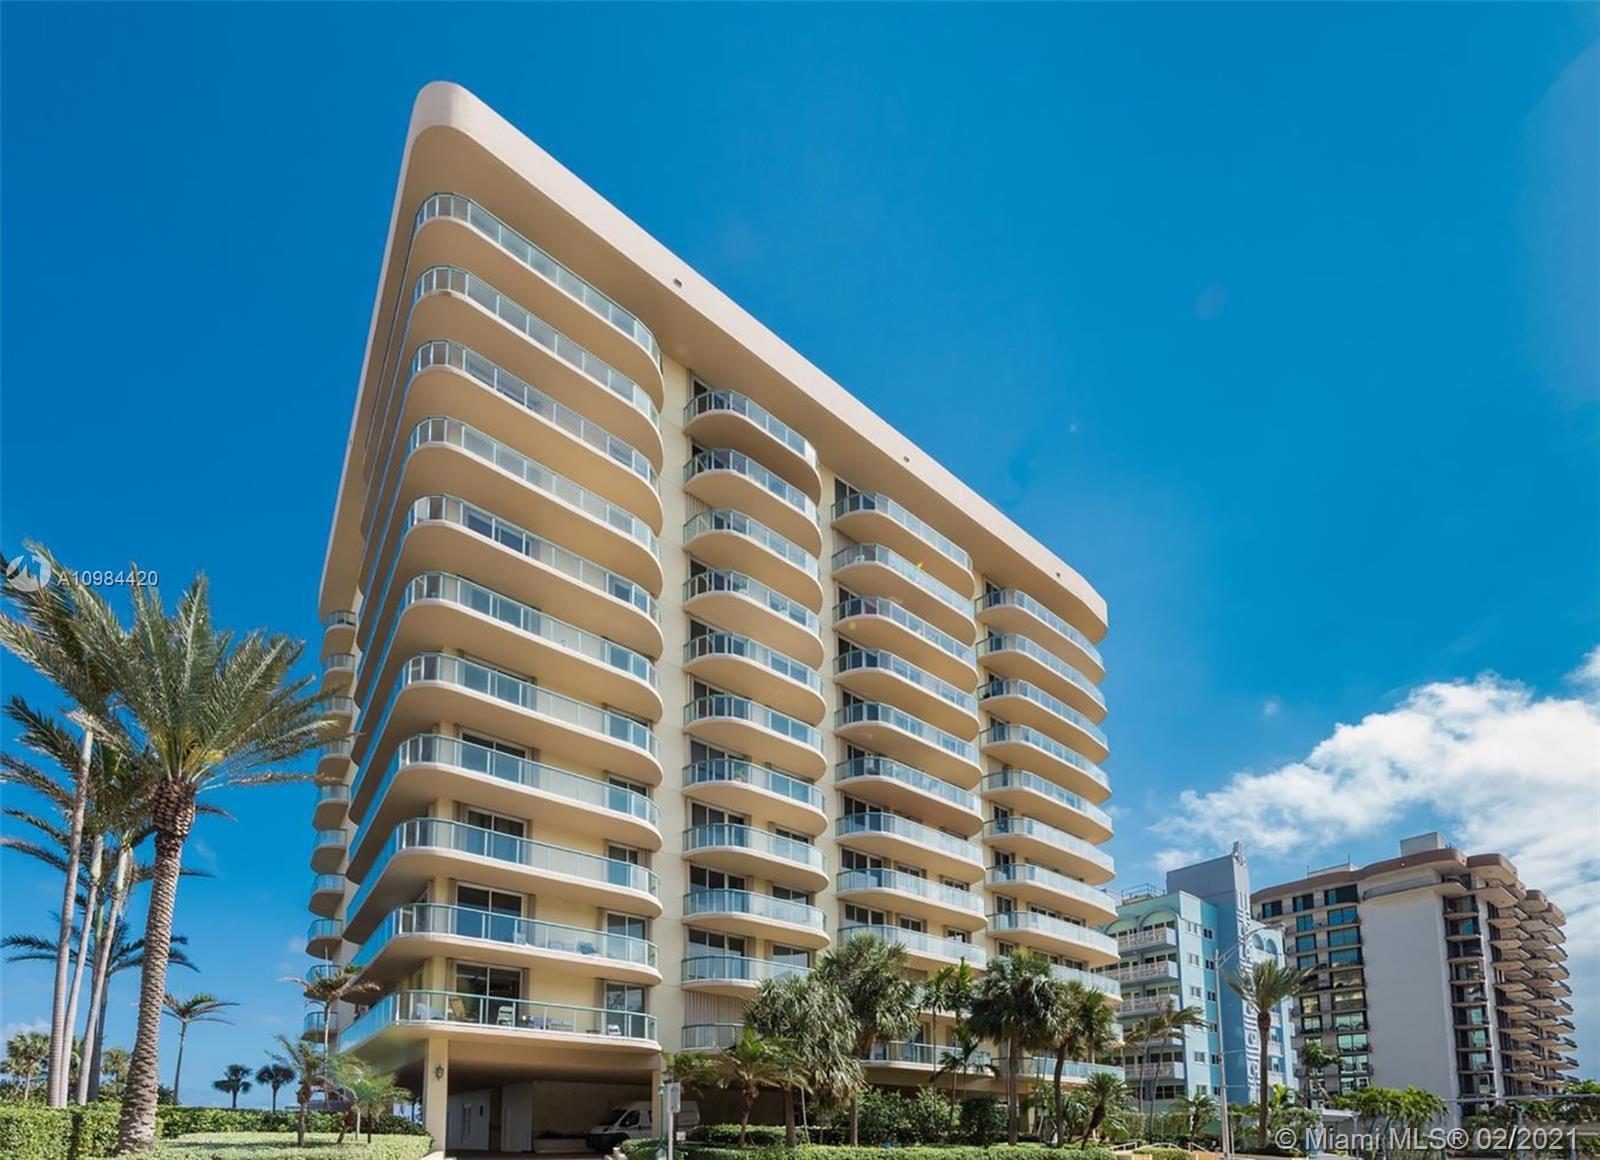 8855 Collins Ave Unit 8 B, Surfside, Florida 33154